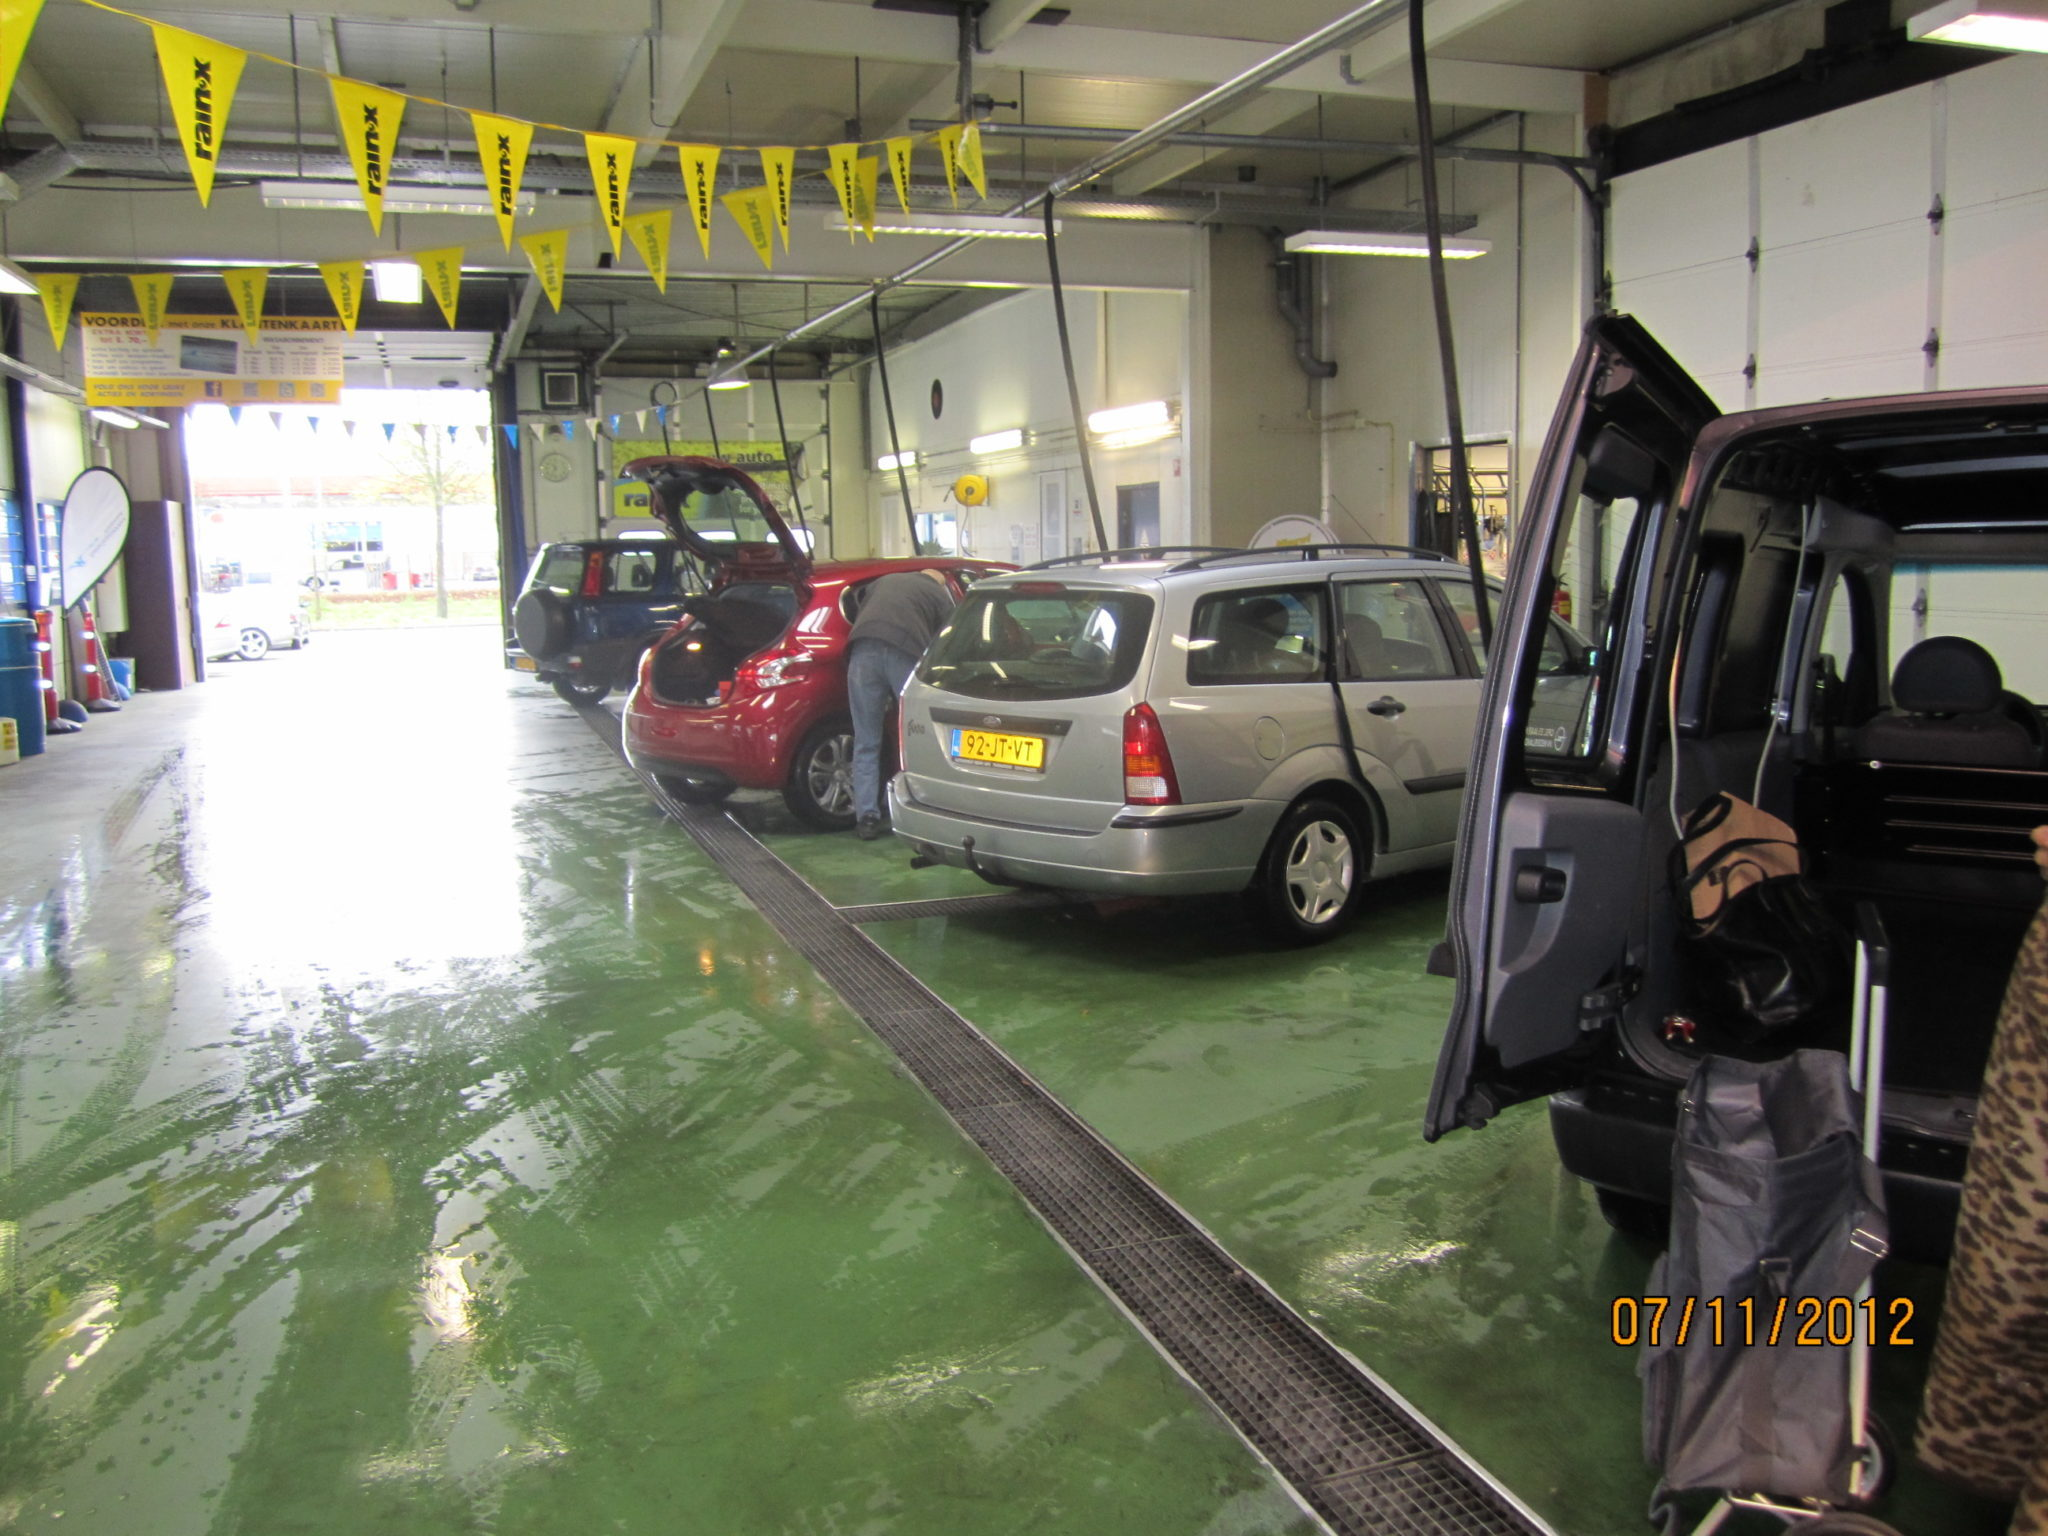 Auto gratis stofzuigen - Autocleanservice Purmerend